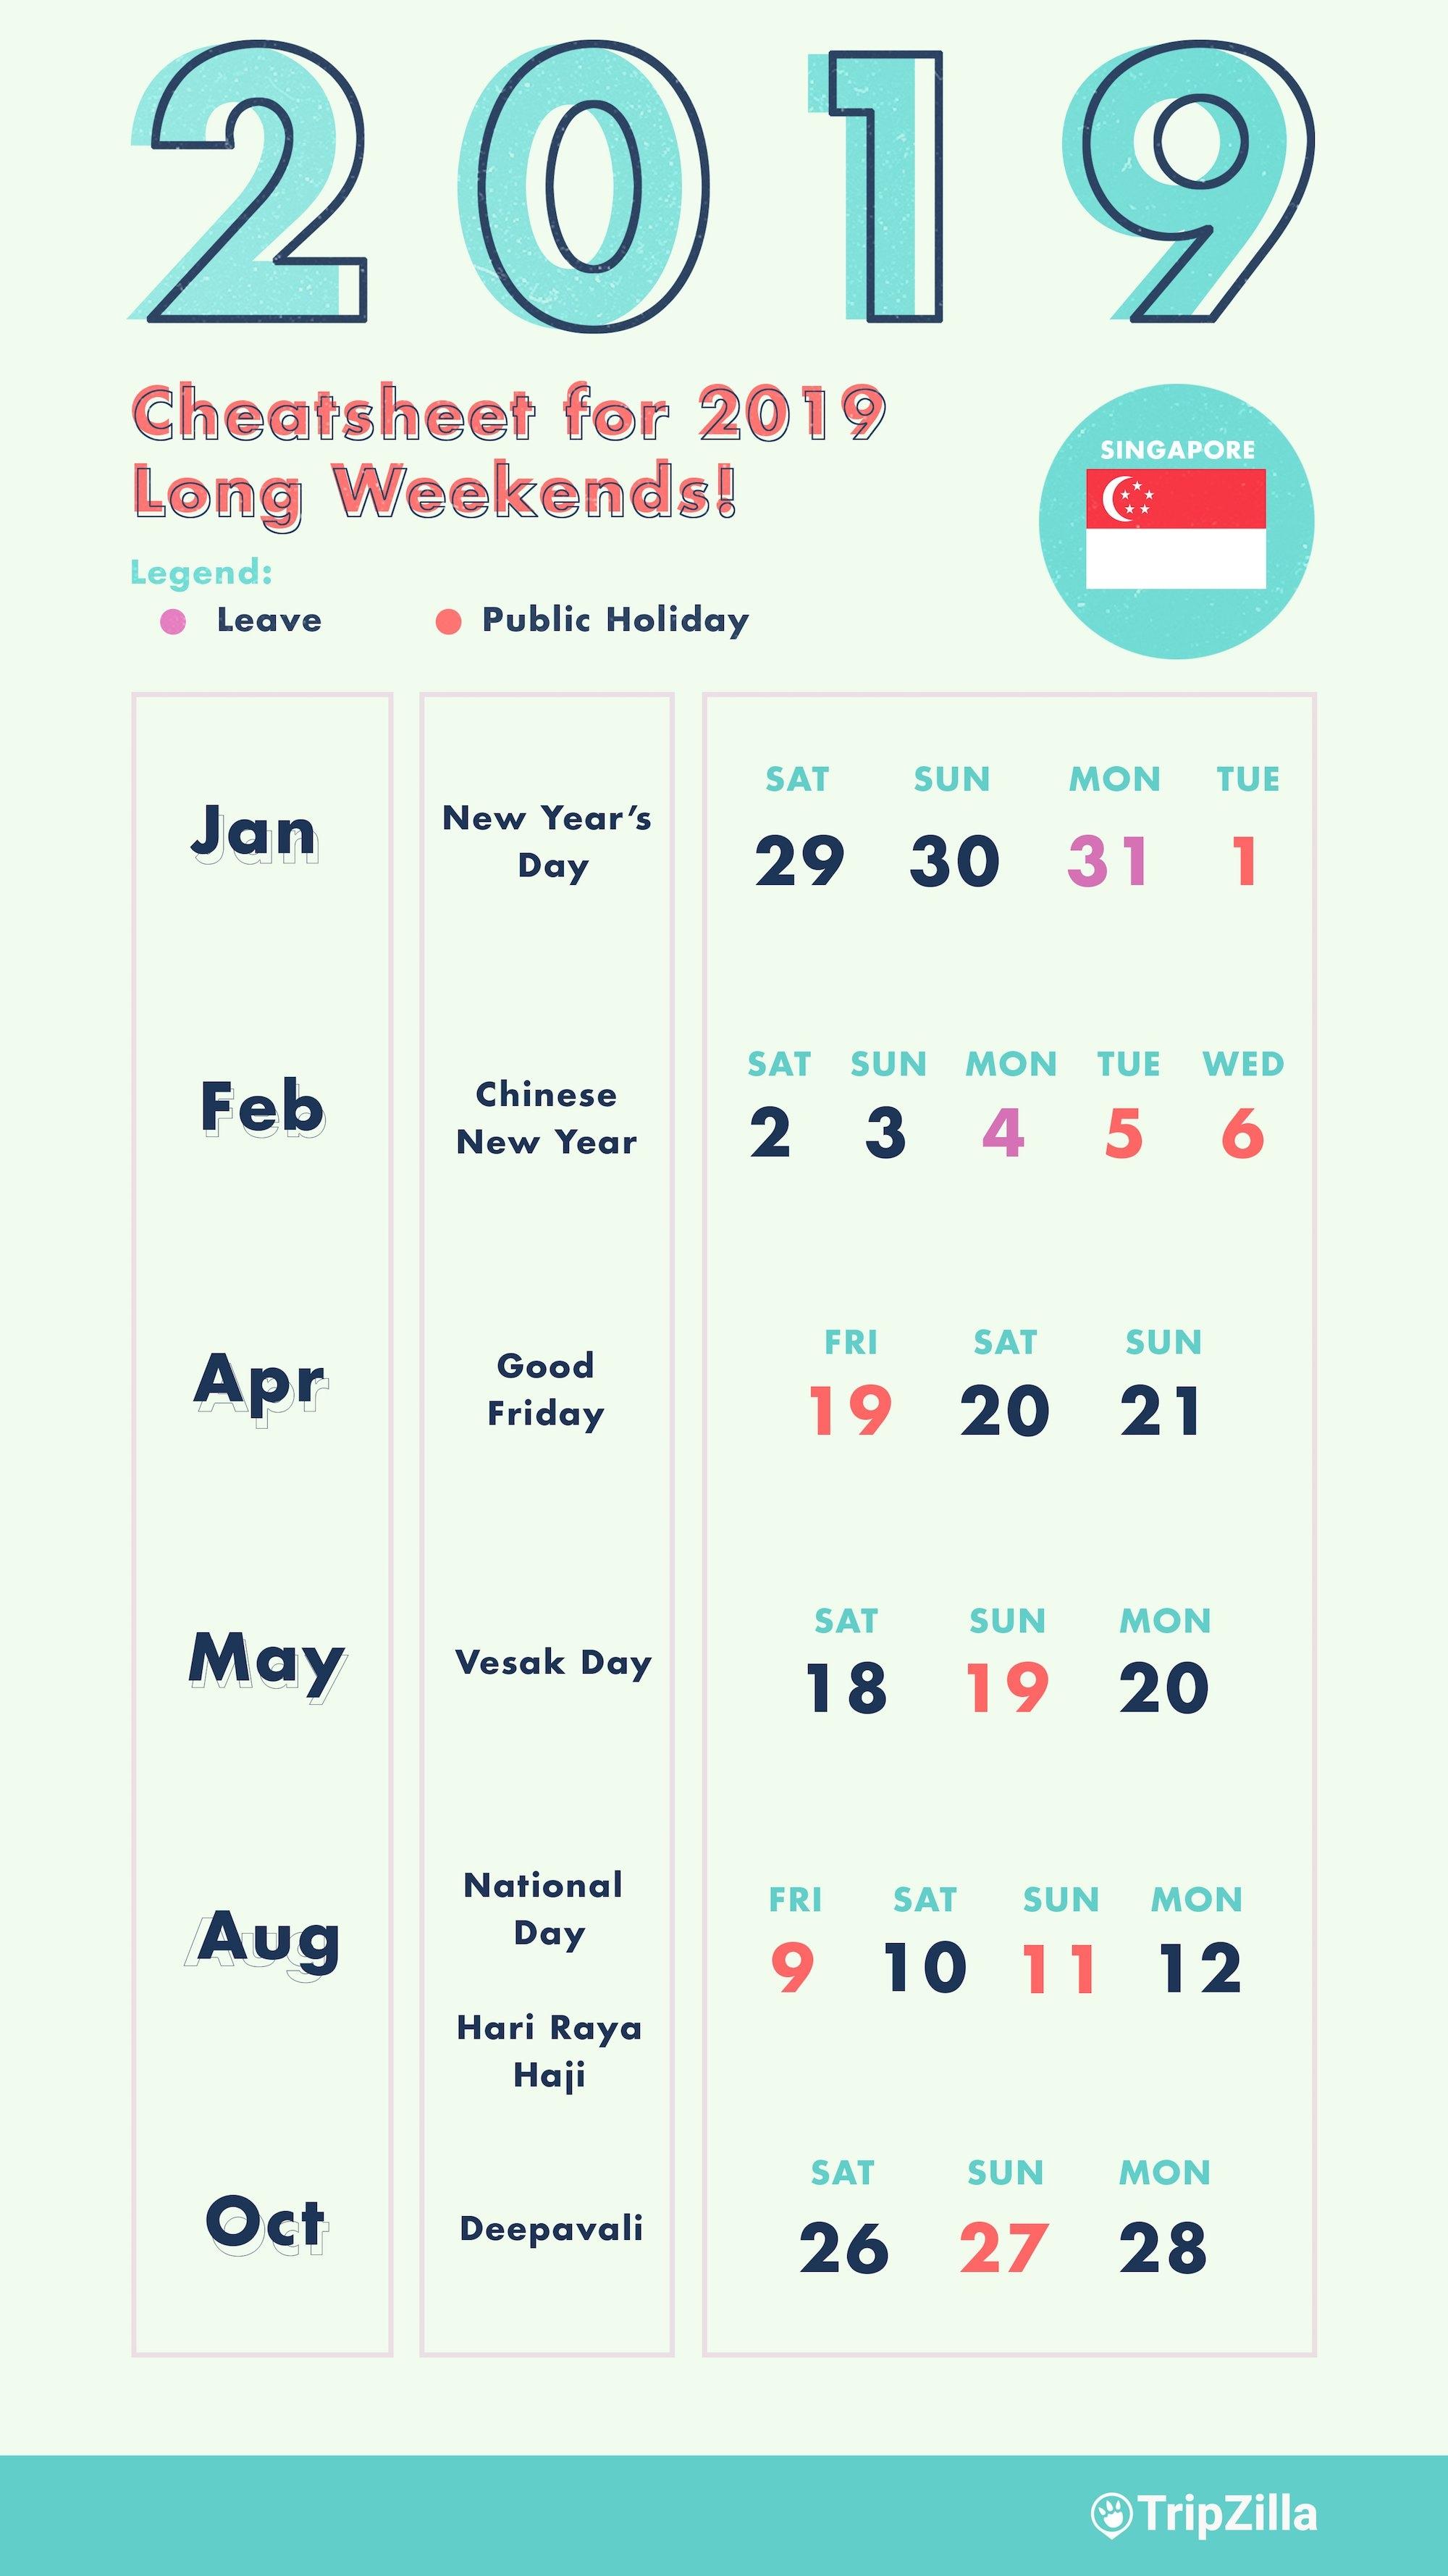 6 Long Weekends In Singapore In 2019 (Bonus Calendar & Cheatsheet) Calendar 2019 Bank Holidays